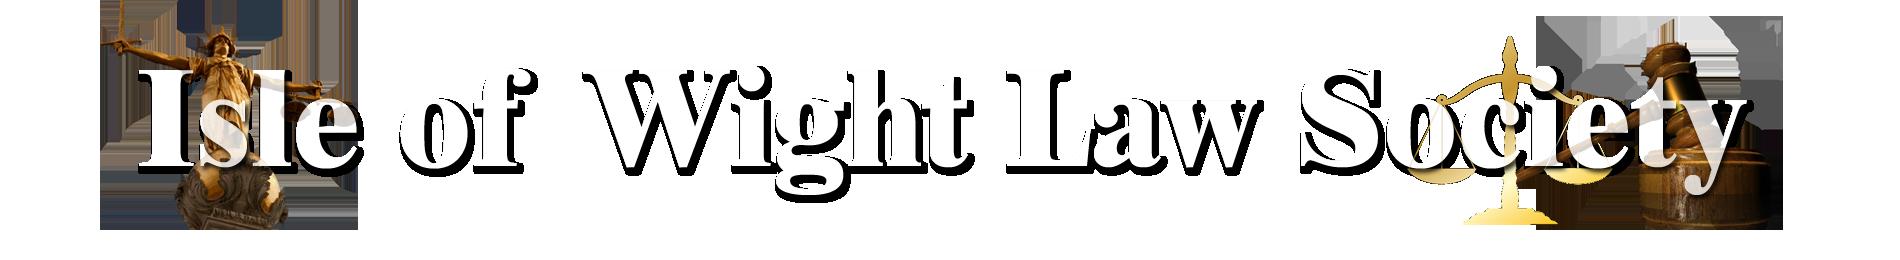 Isle of wight law society Logo